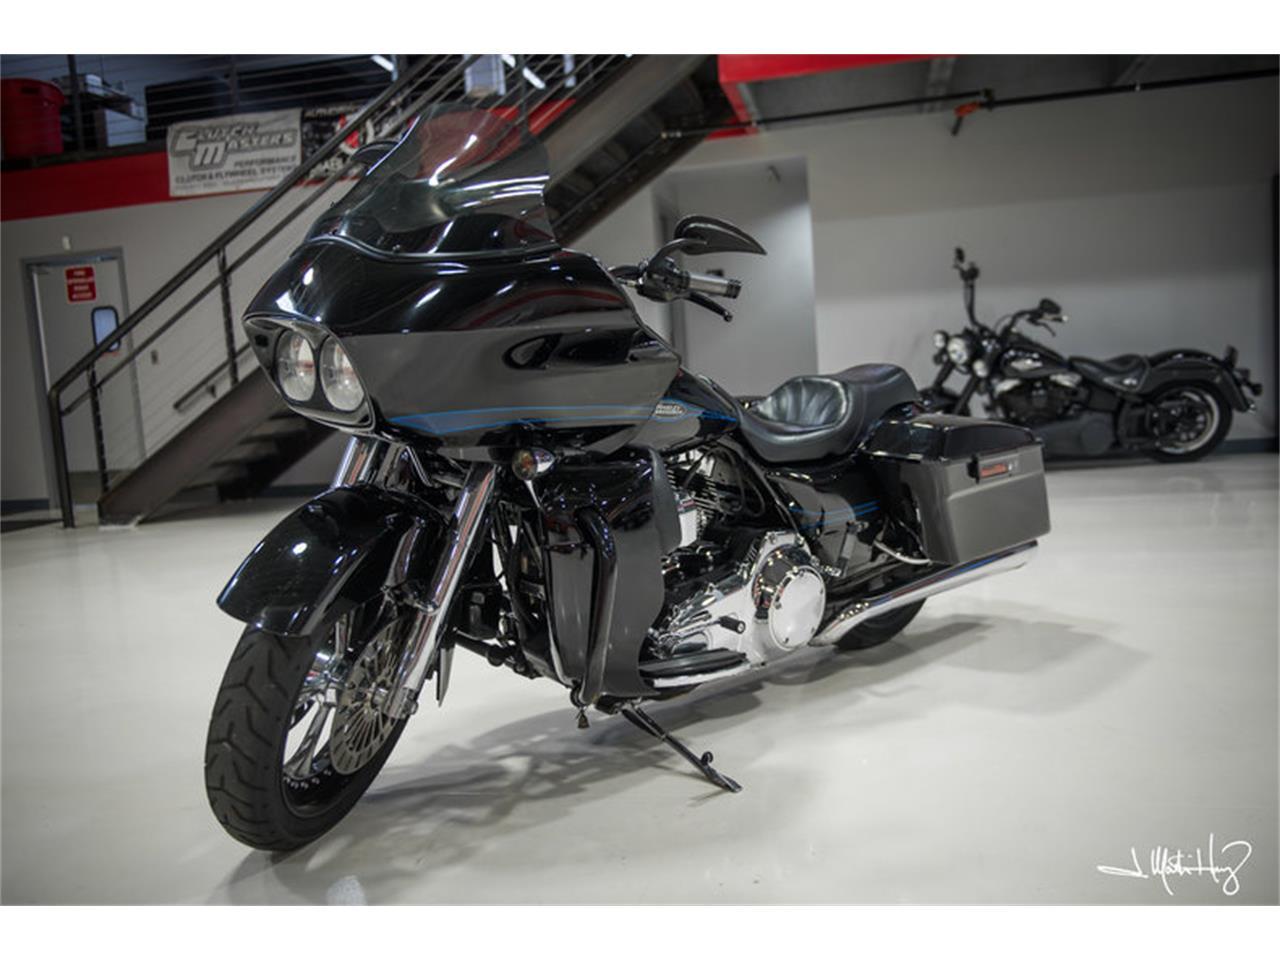 2009 Harley Davidson Road Glide For Sale Classiccars Com Cc 935198